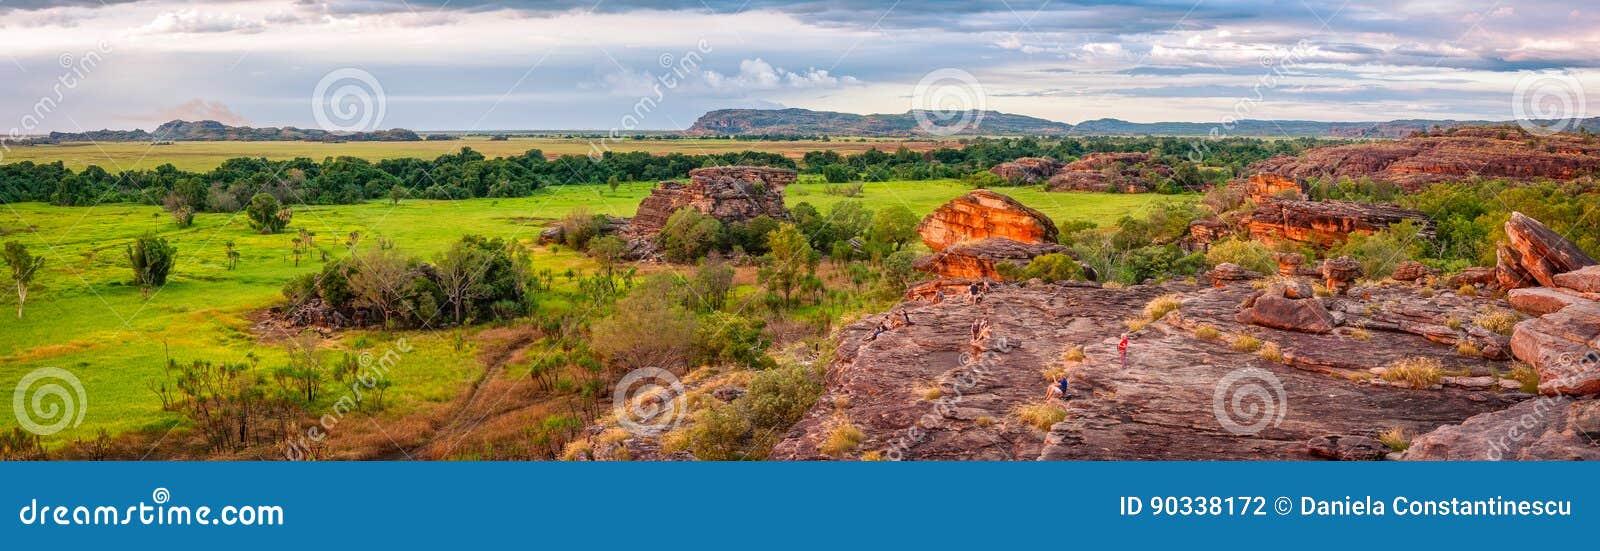 Ubirr Rock panorama at sunset -Northern Territory, Australia